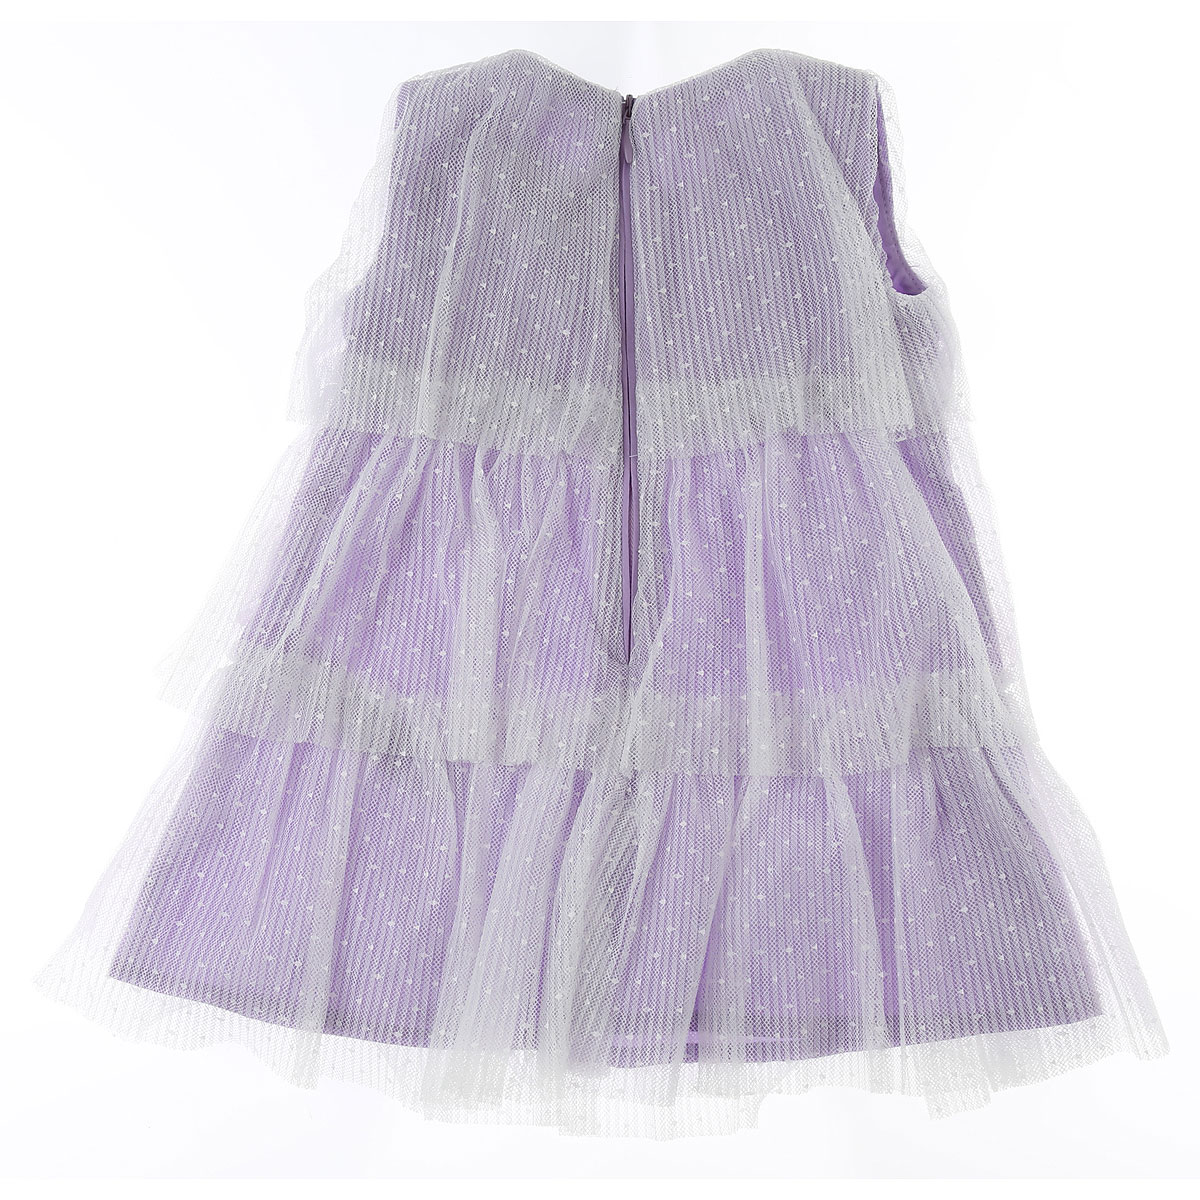 Liu Jo Baby Dress for Girls On Sale, Iris, polyester, 2019, 12M 18M 3M 6M